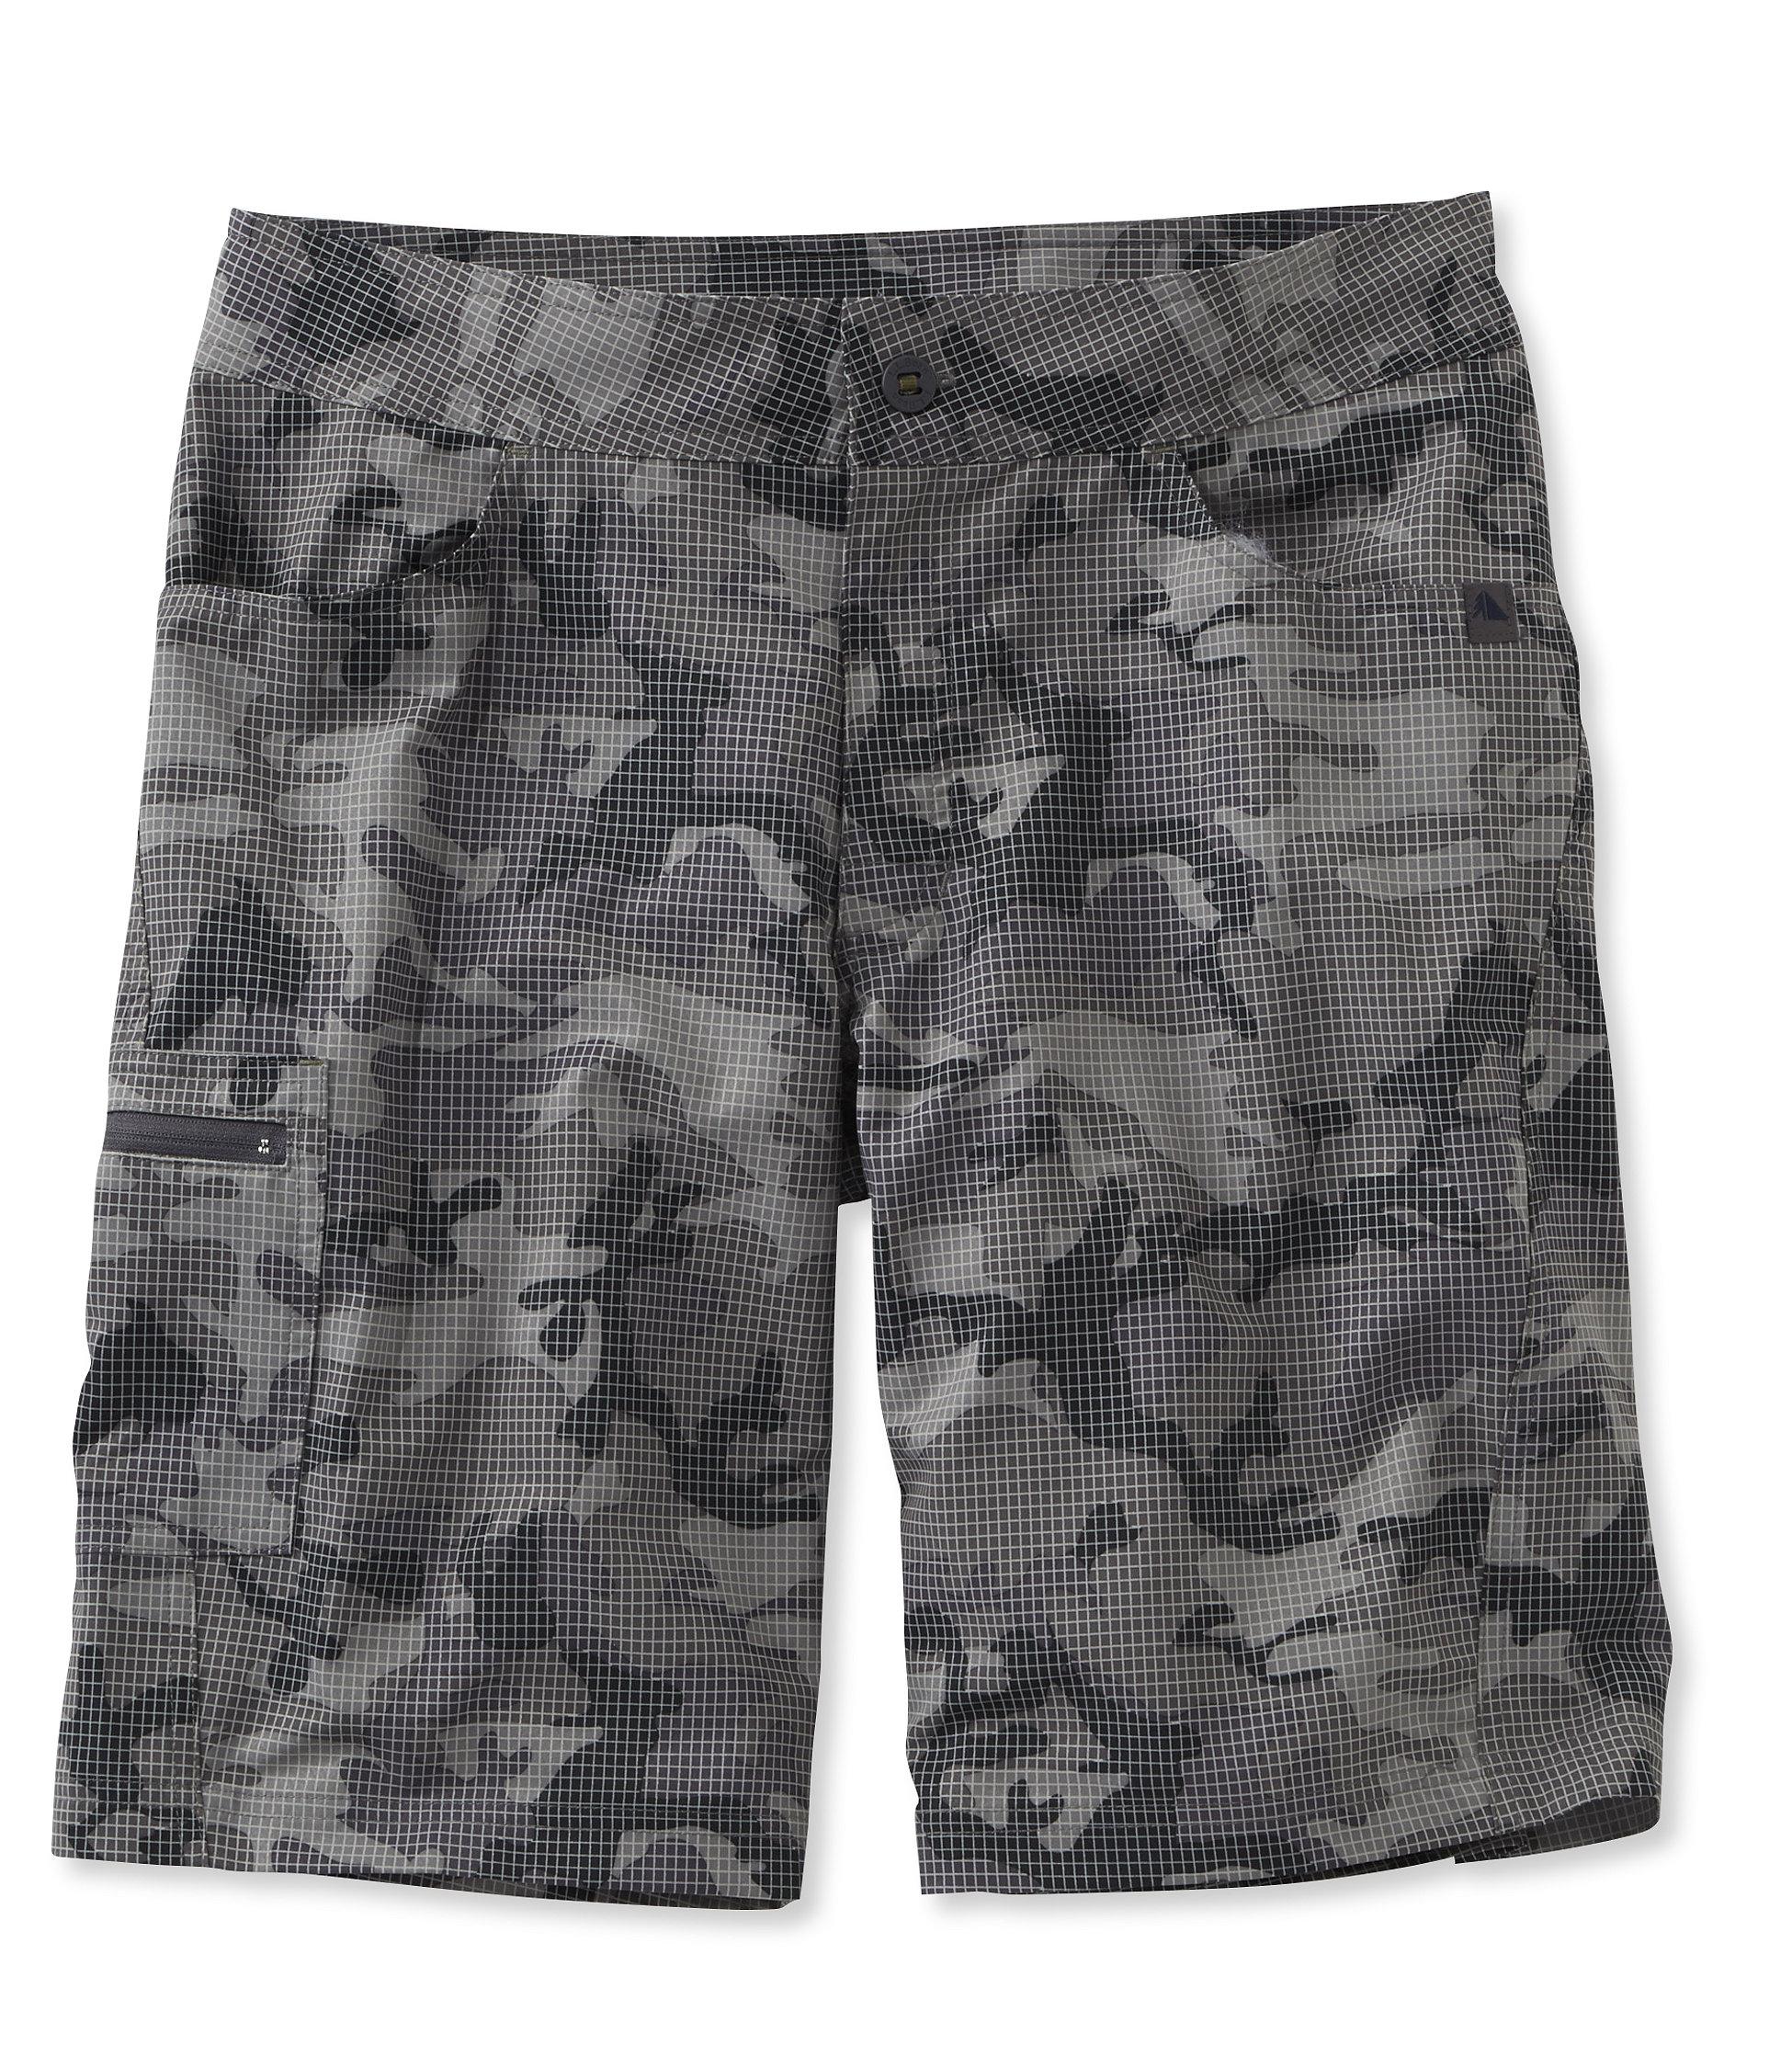 L.L.Bean Approach Hybrid Shorts